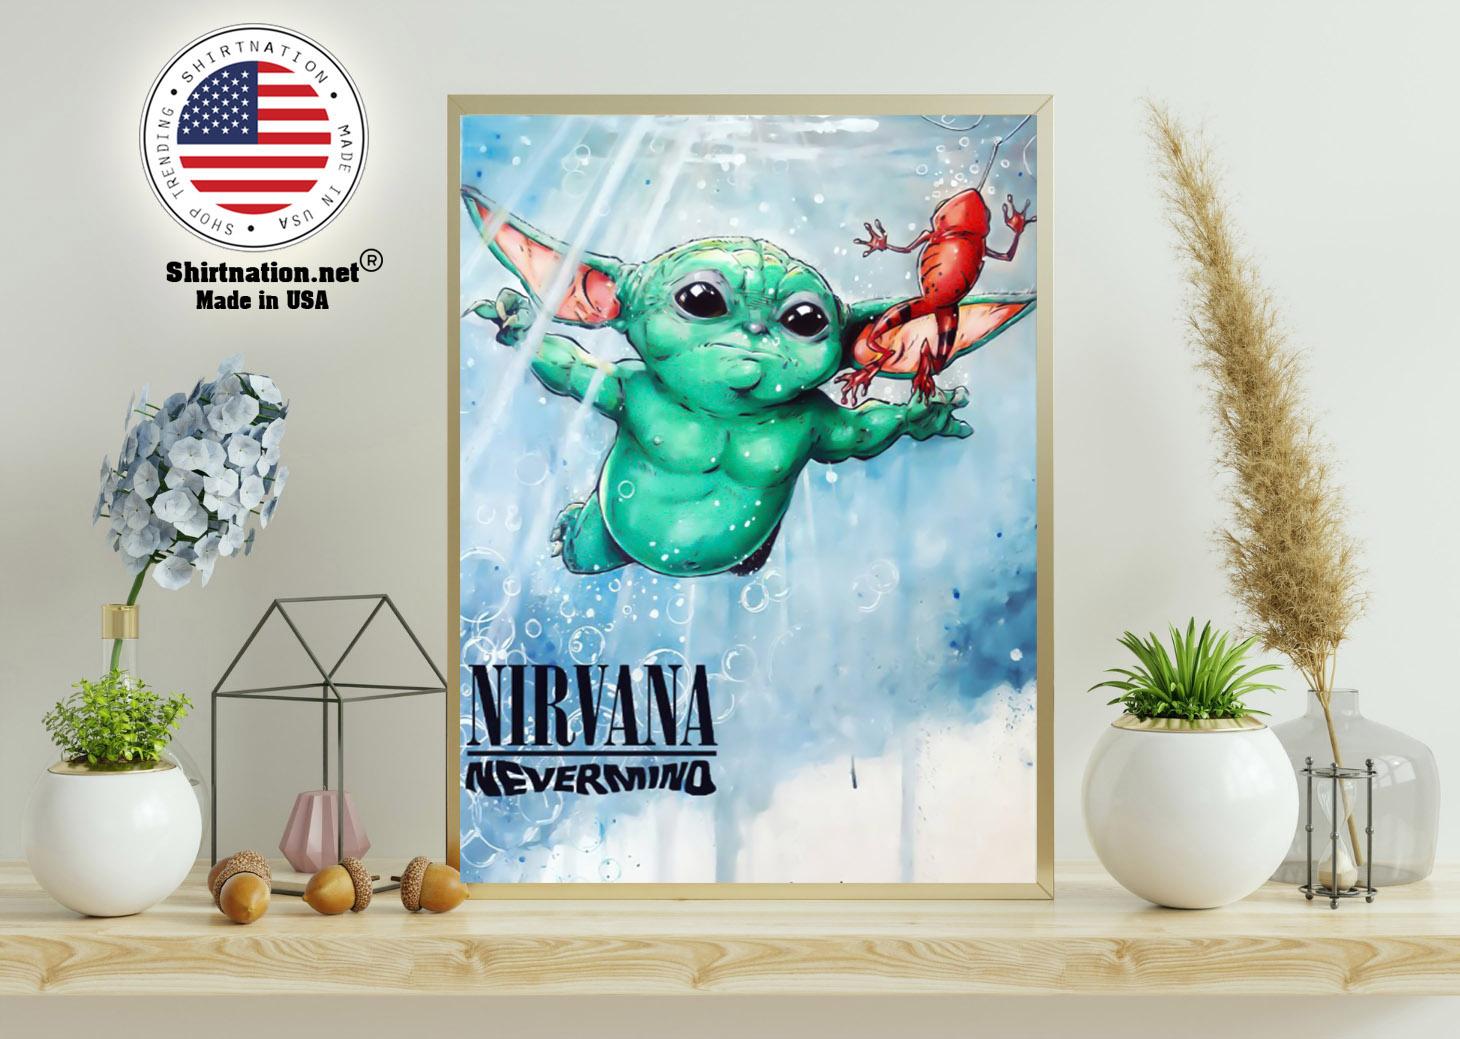 Baby Yoda nirvana never mind poster 11